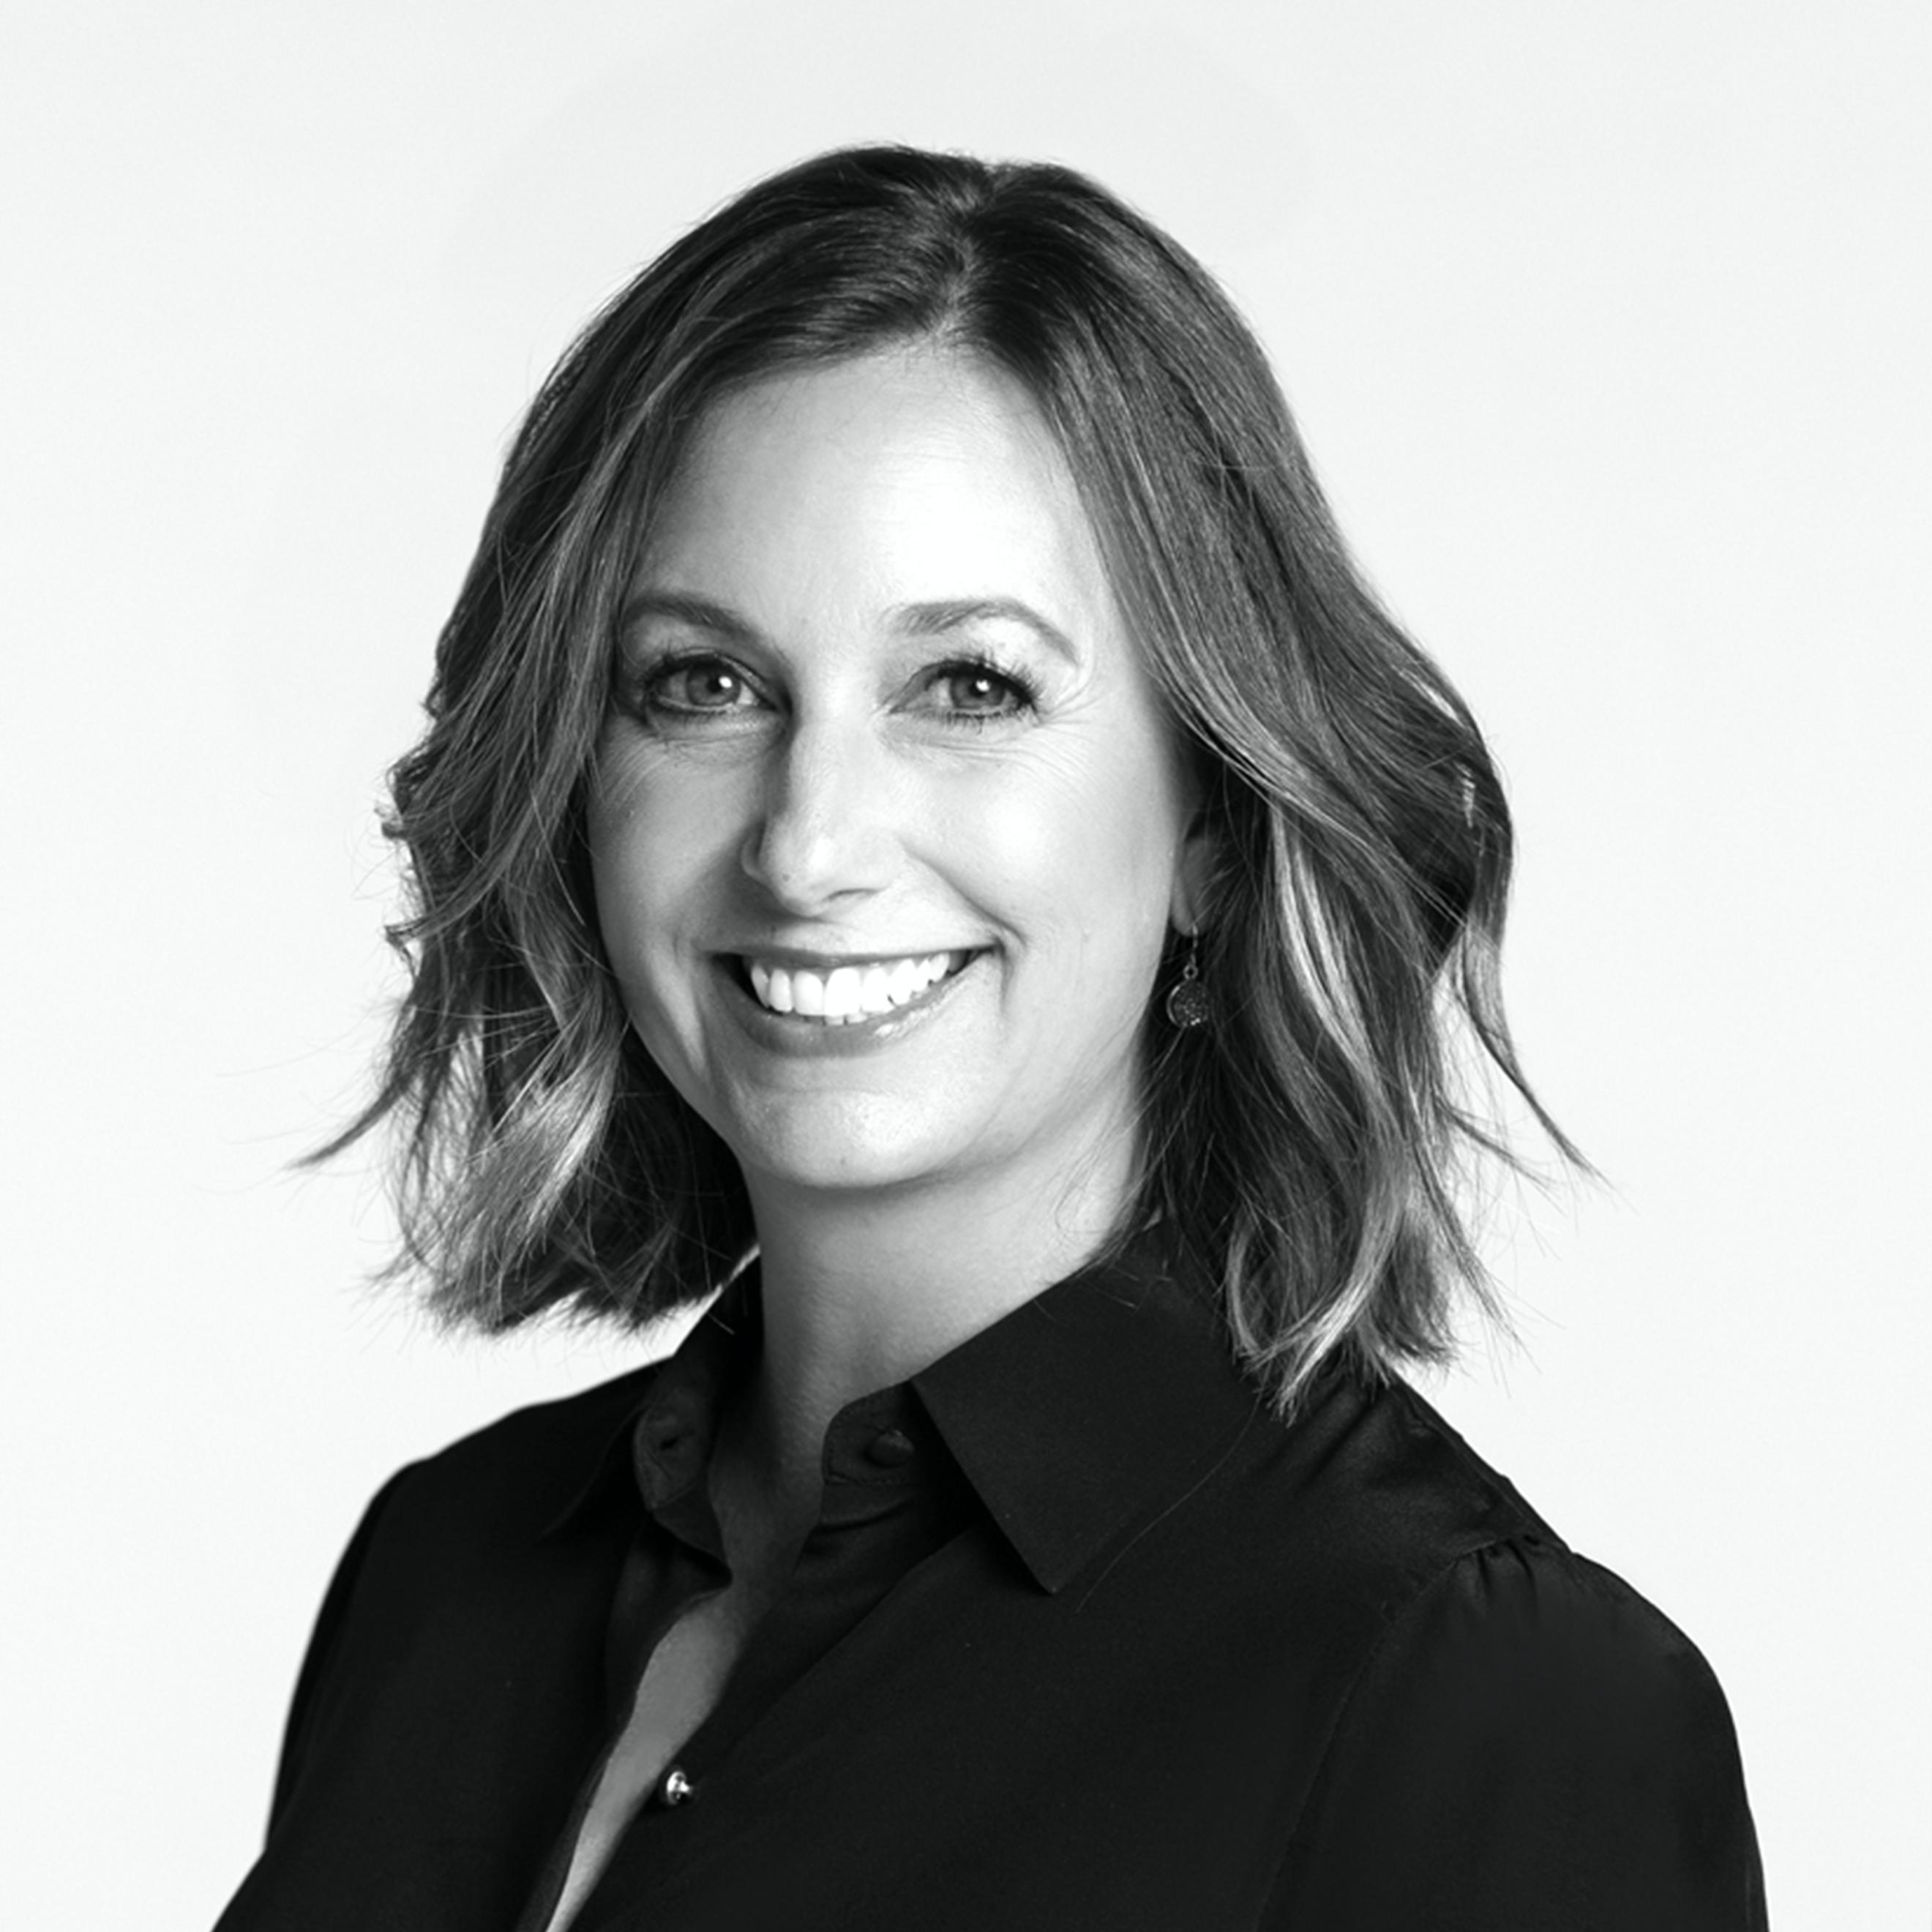 Jennifer Napierala (Leadership)